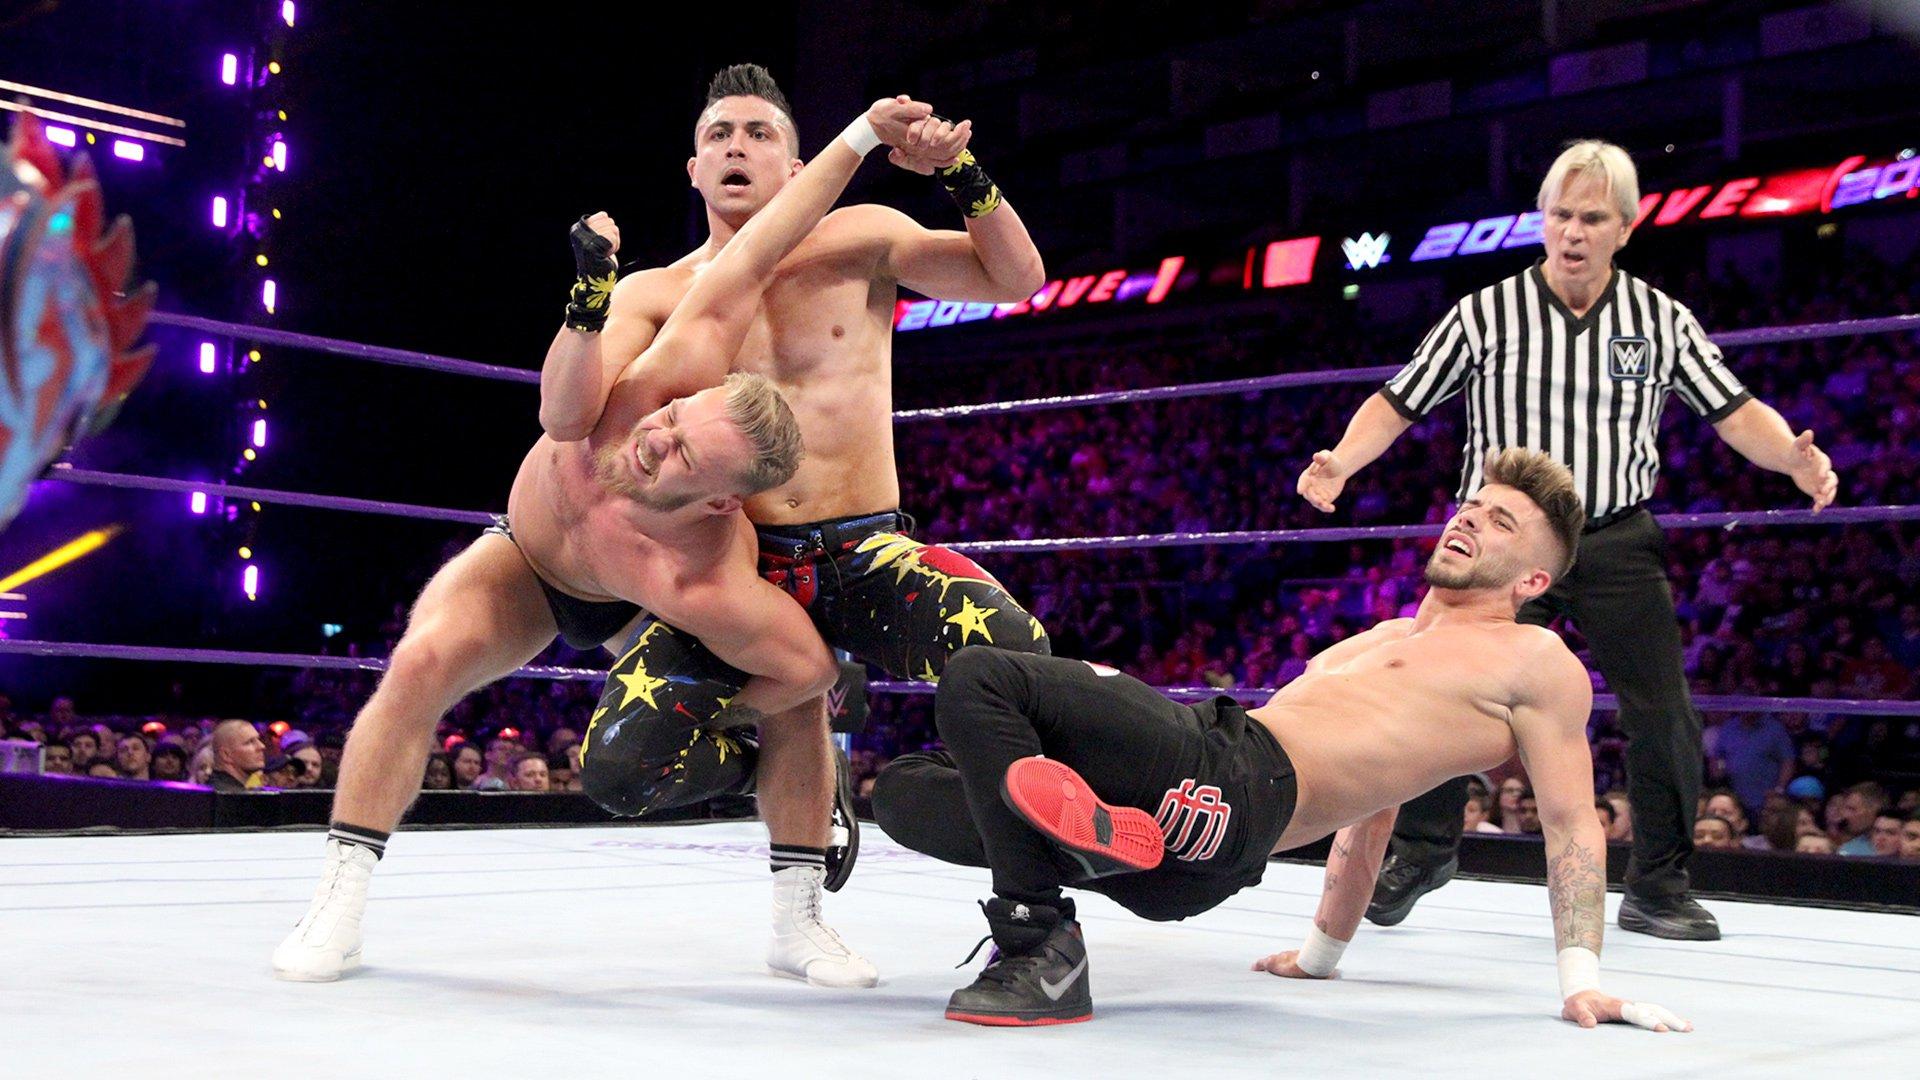 Kalisto vs. Tyler Bate vs. TJP vs. Kenny Williams - Fatal 4-Way Match: WWE 205 Live, 15 Mai 2018